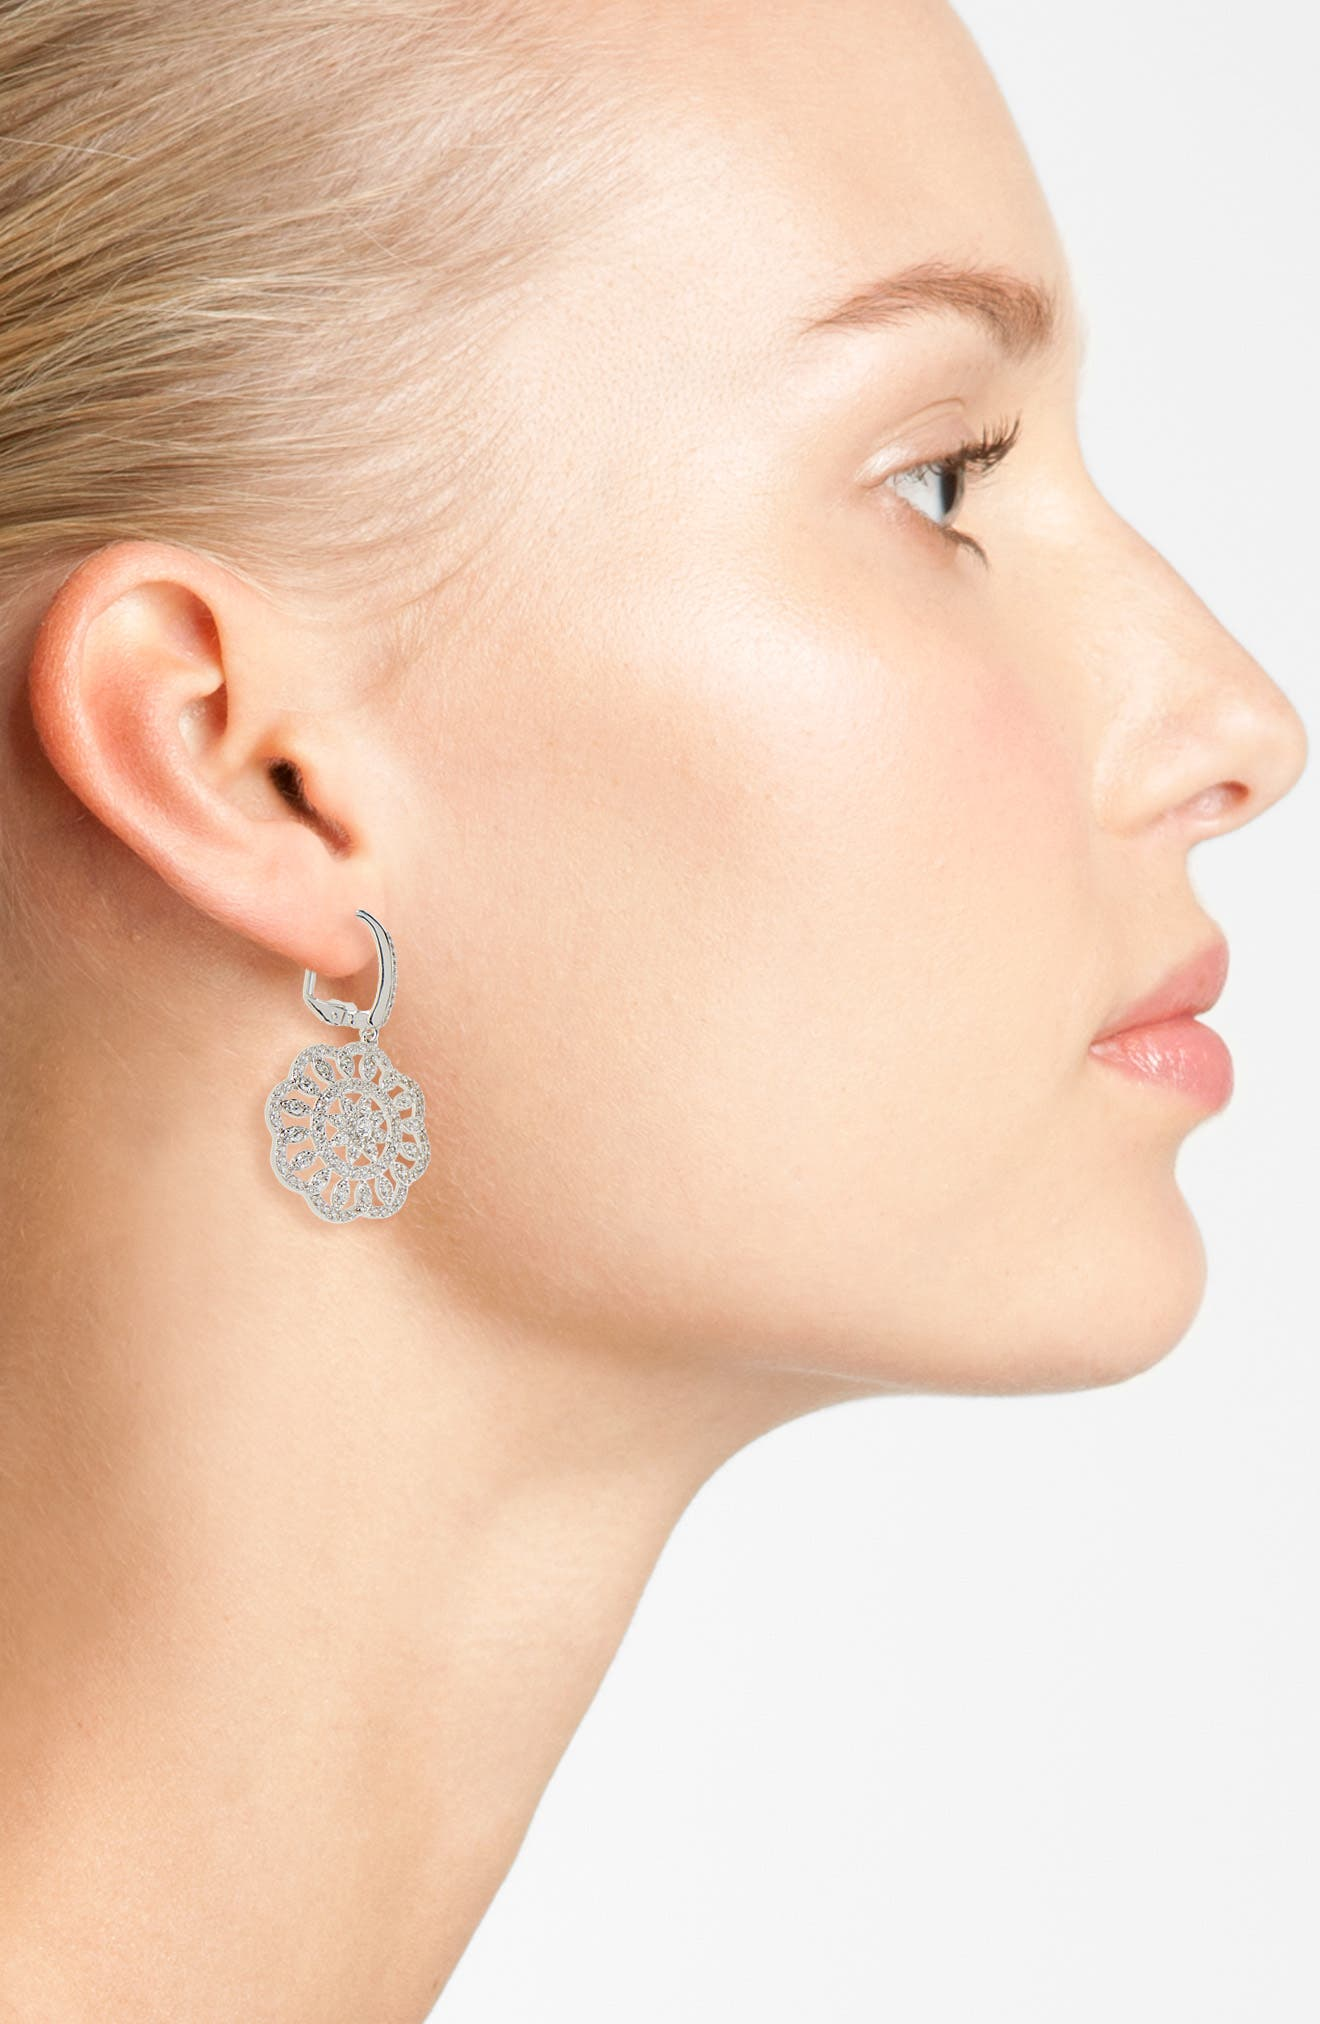 Sunburst Drop Earrings,                             Alternate thumbnail 2, color,                             Silver